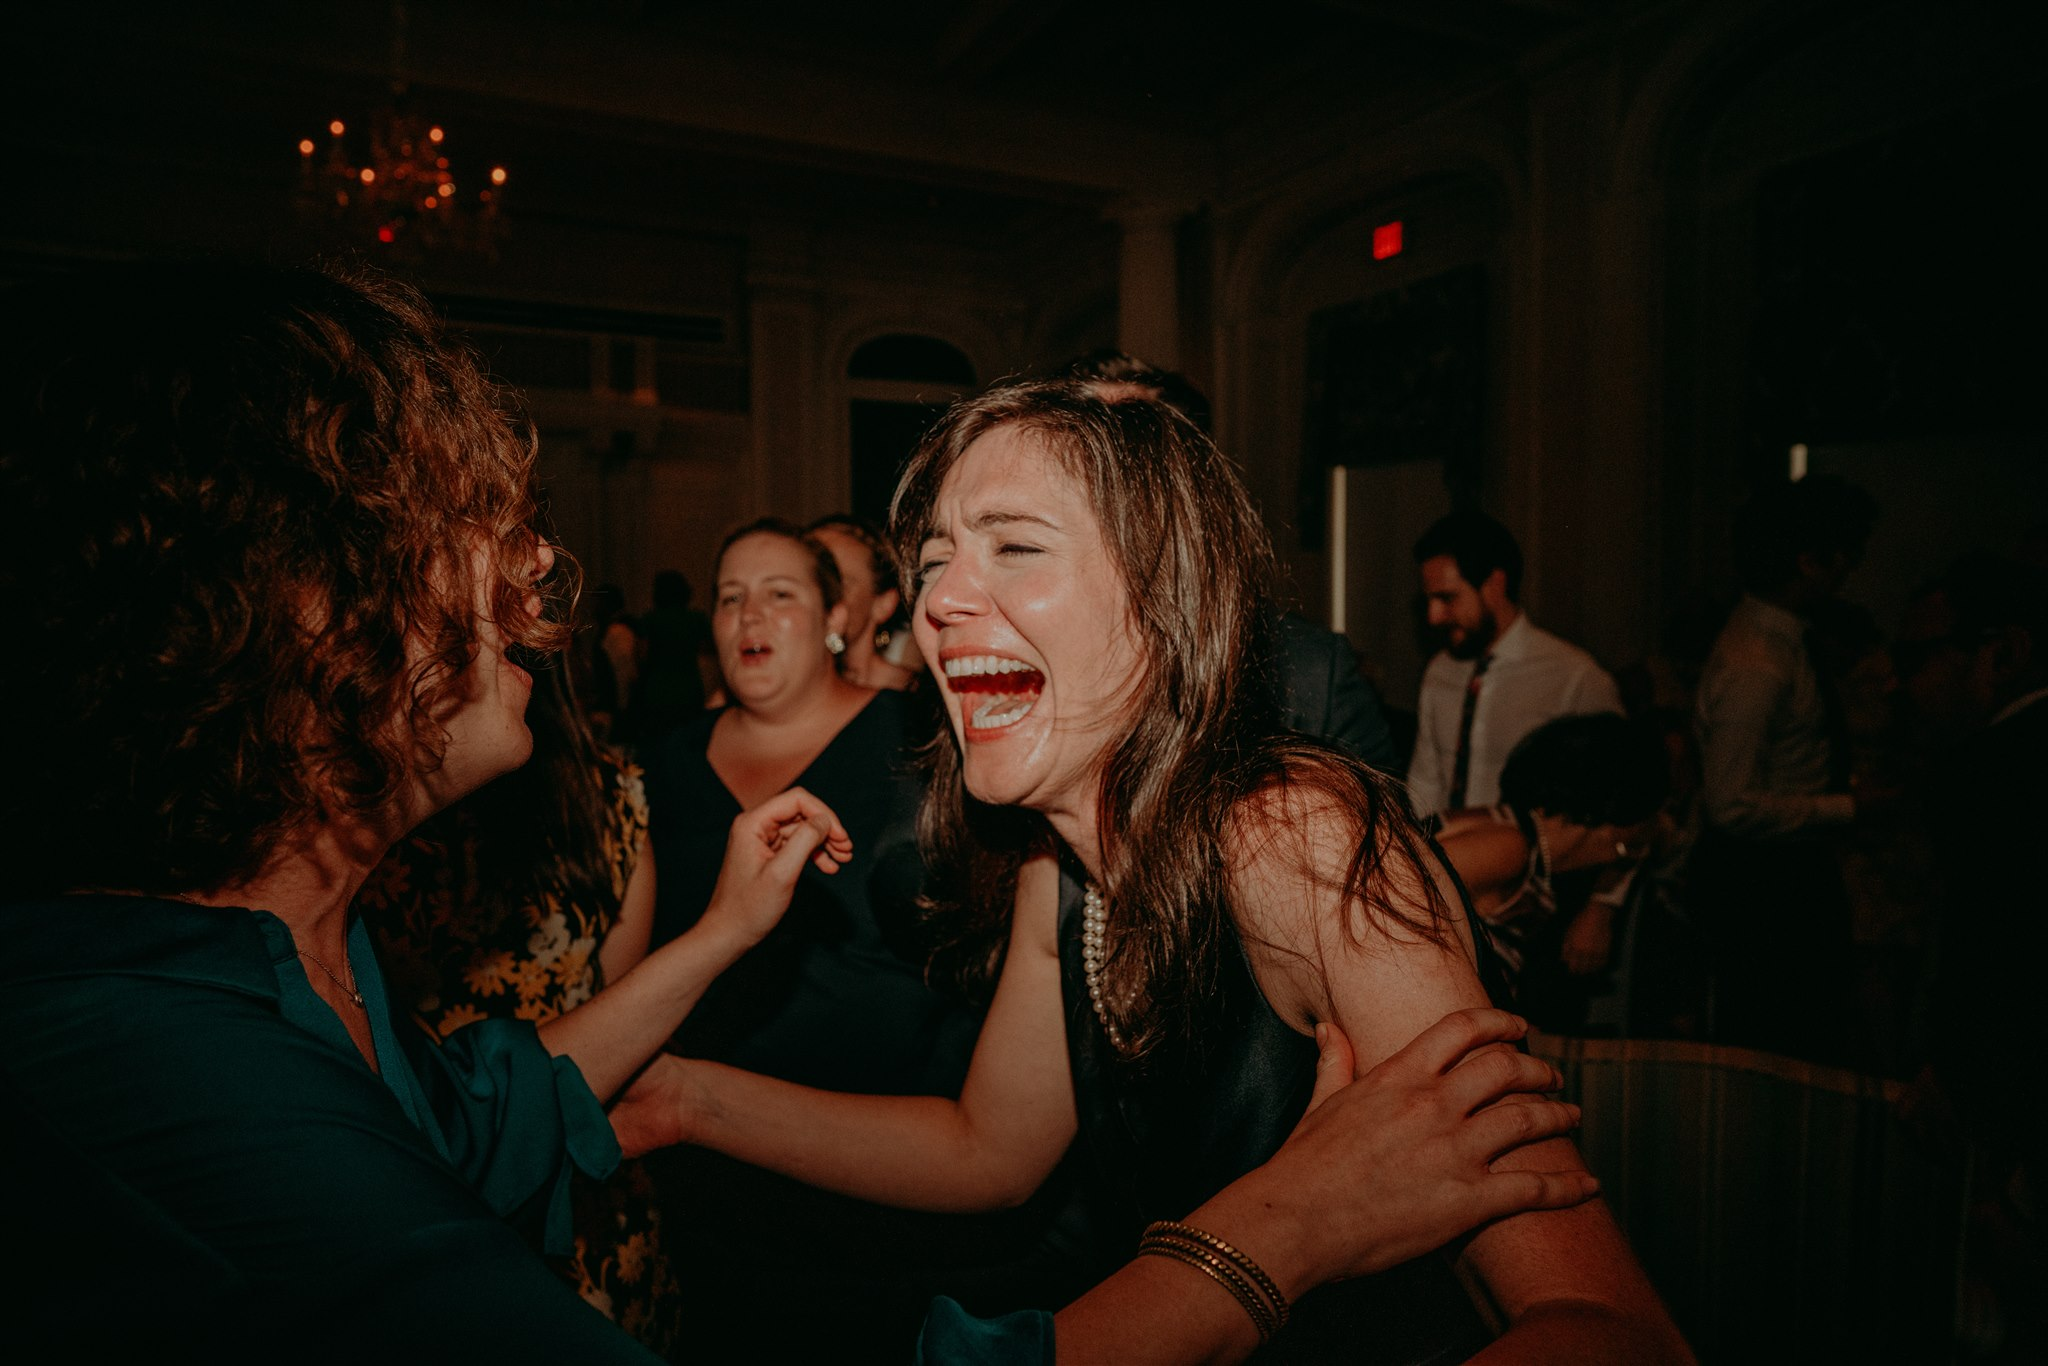 Chellise_Michael_Photography_Hudson_Valley_Wedding_Photographer_Otesaga_Hotel-6041.jpg